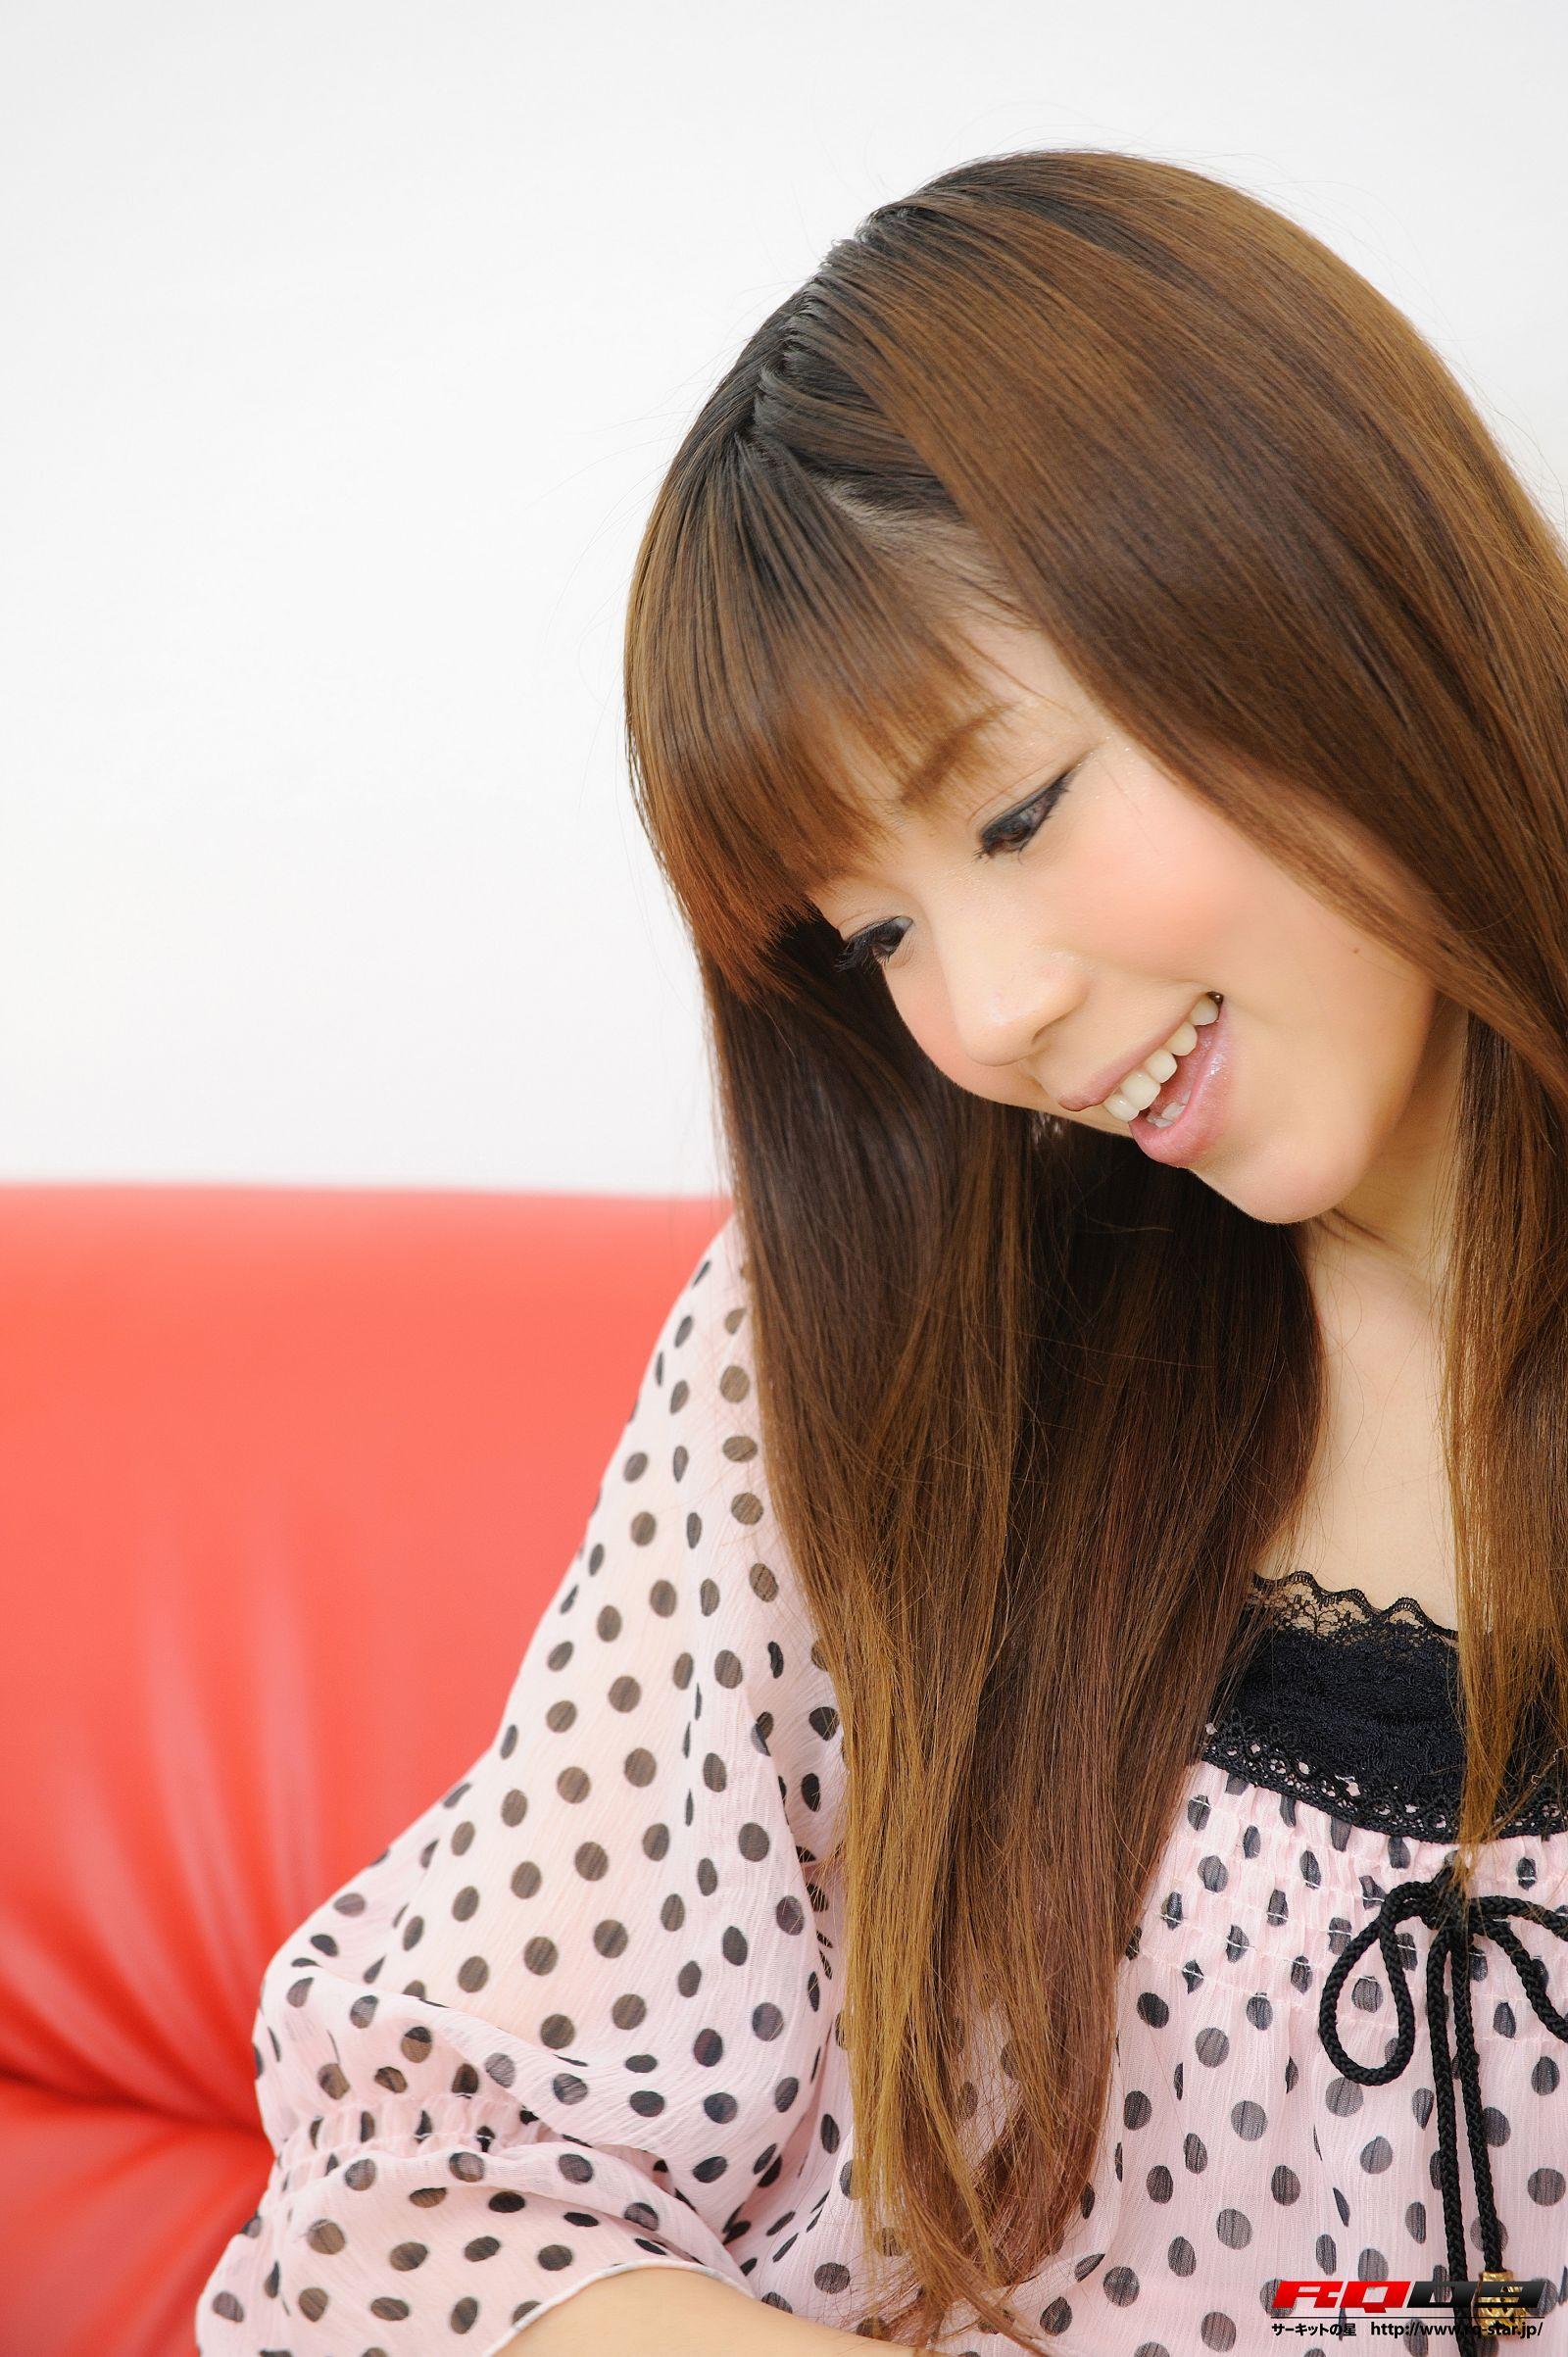 [RQ-STAR美女] NO.0164 Yuko Momokawa 桃川祐子 Private Dress 21